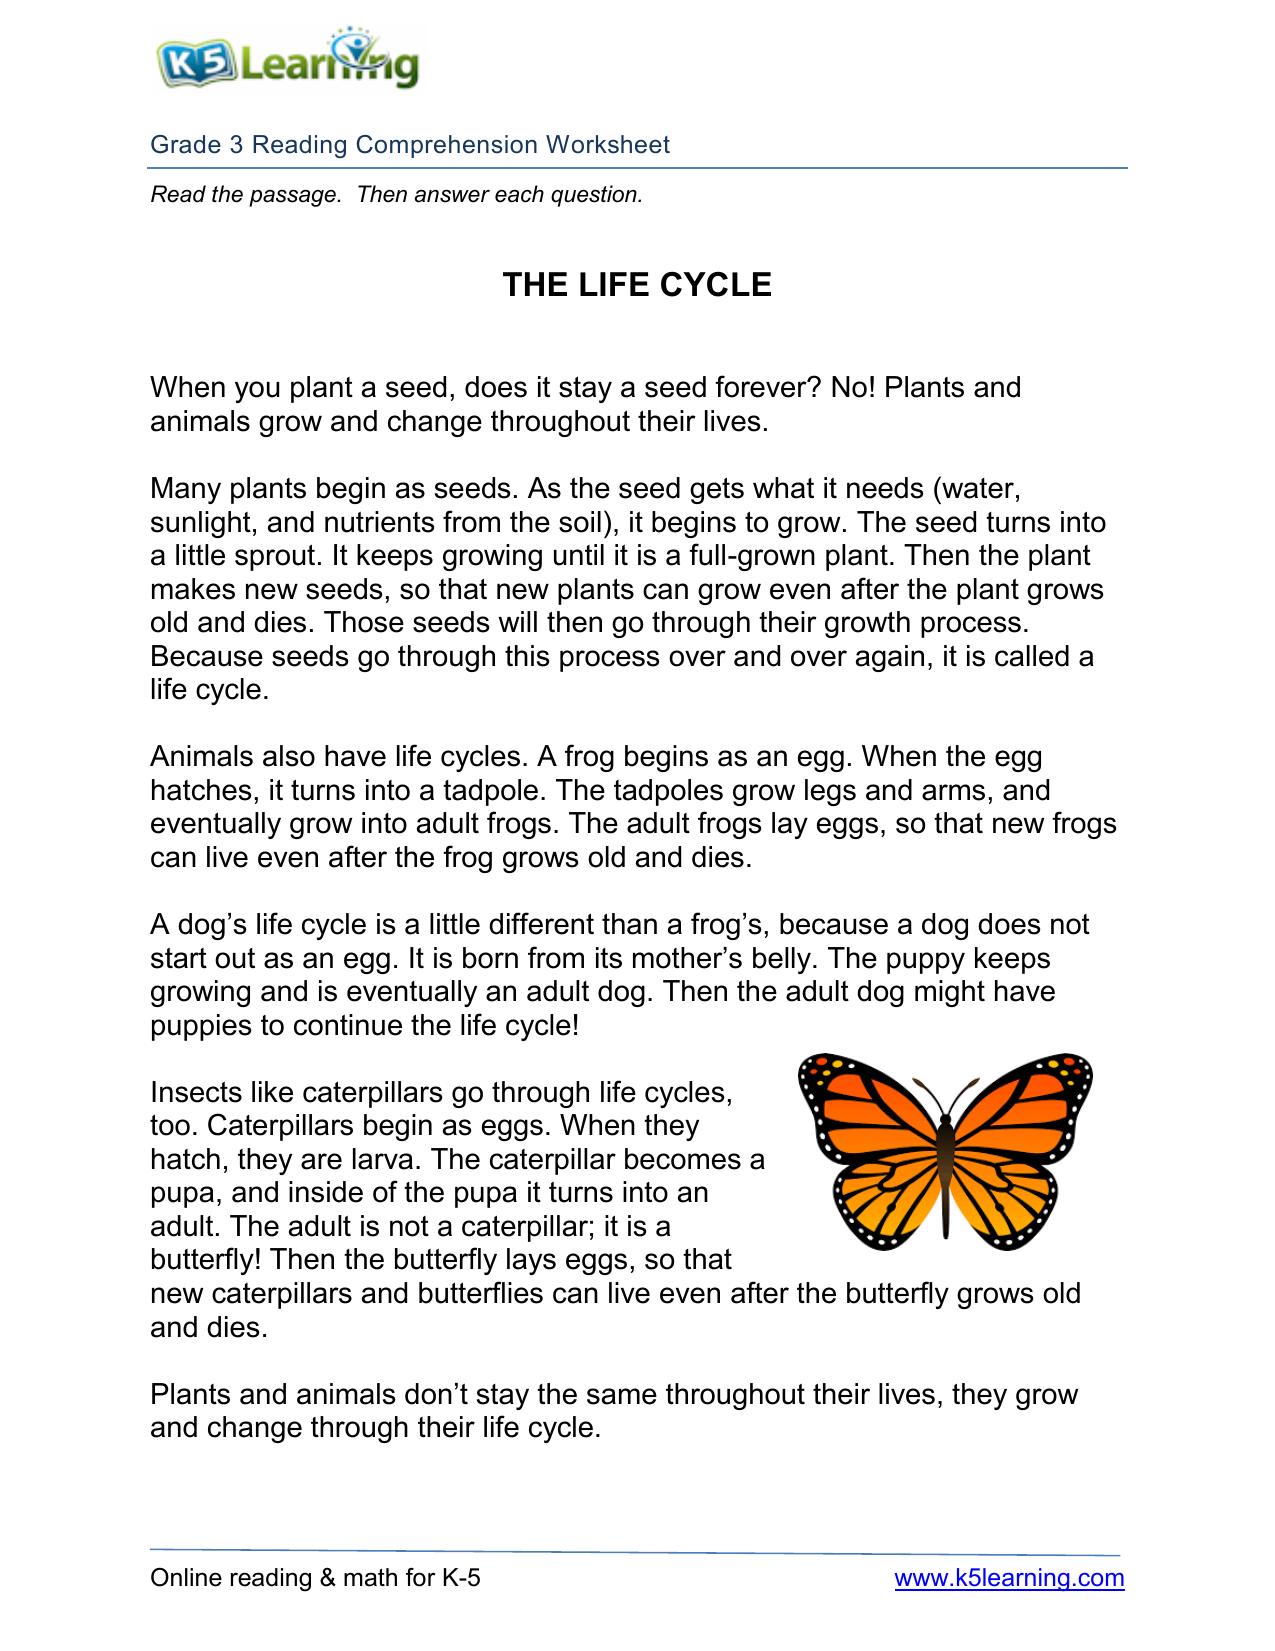 3rd-grade-3-reading-life-cycle